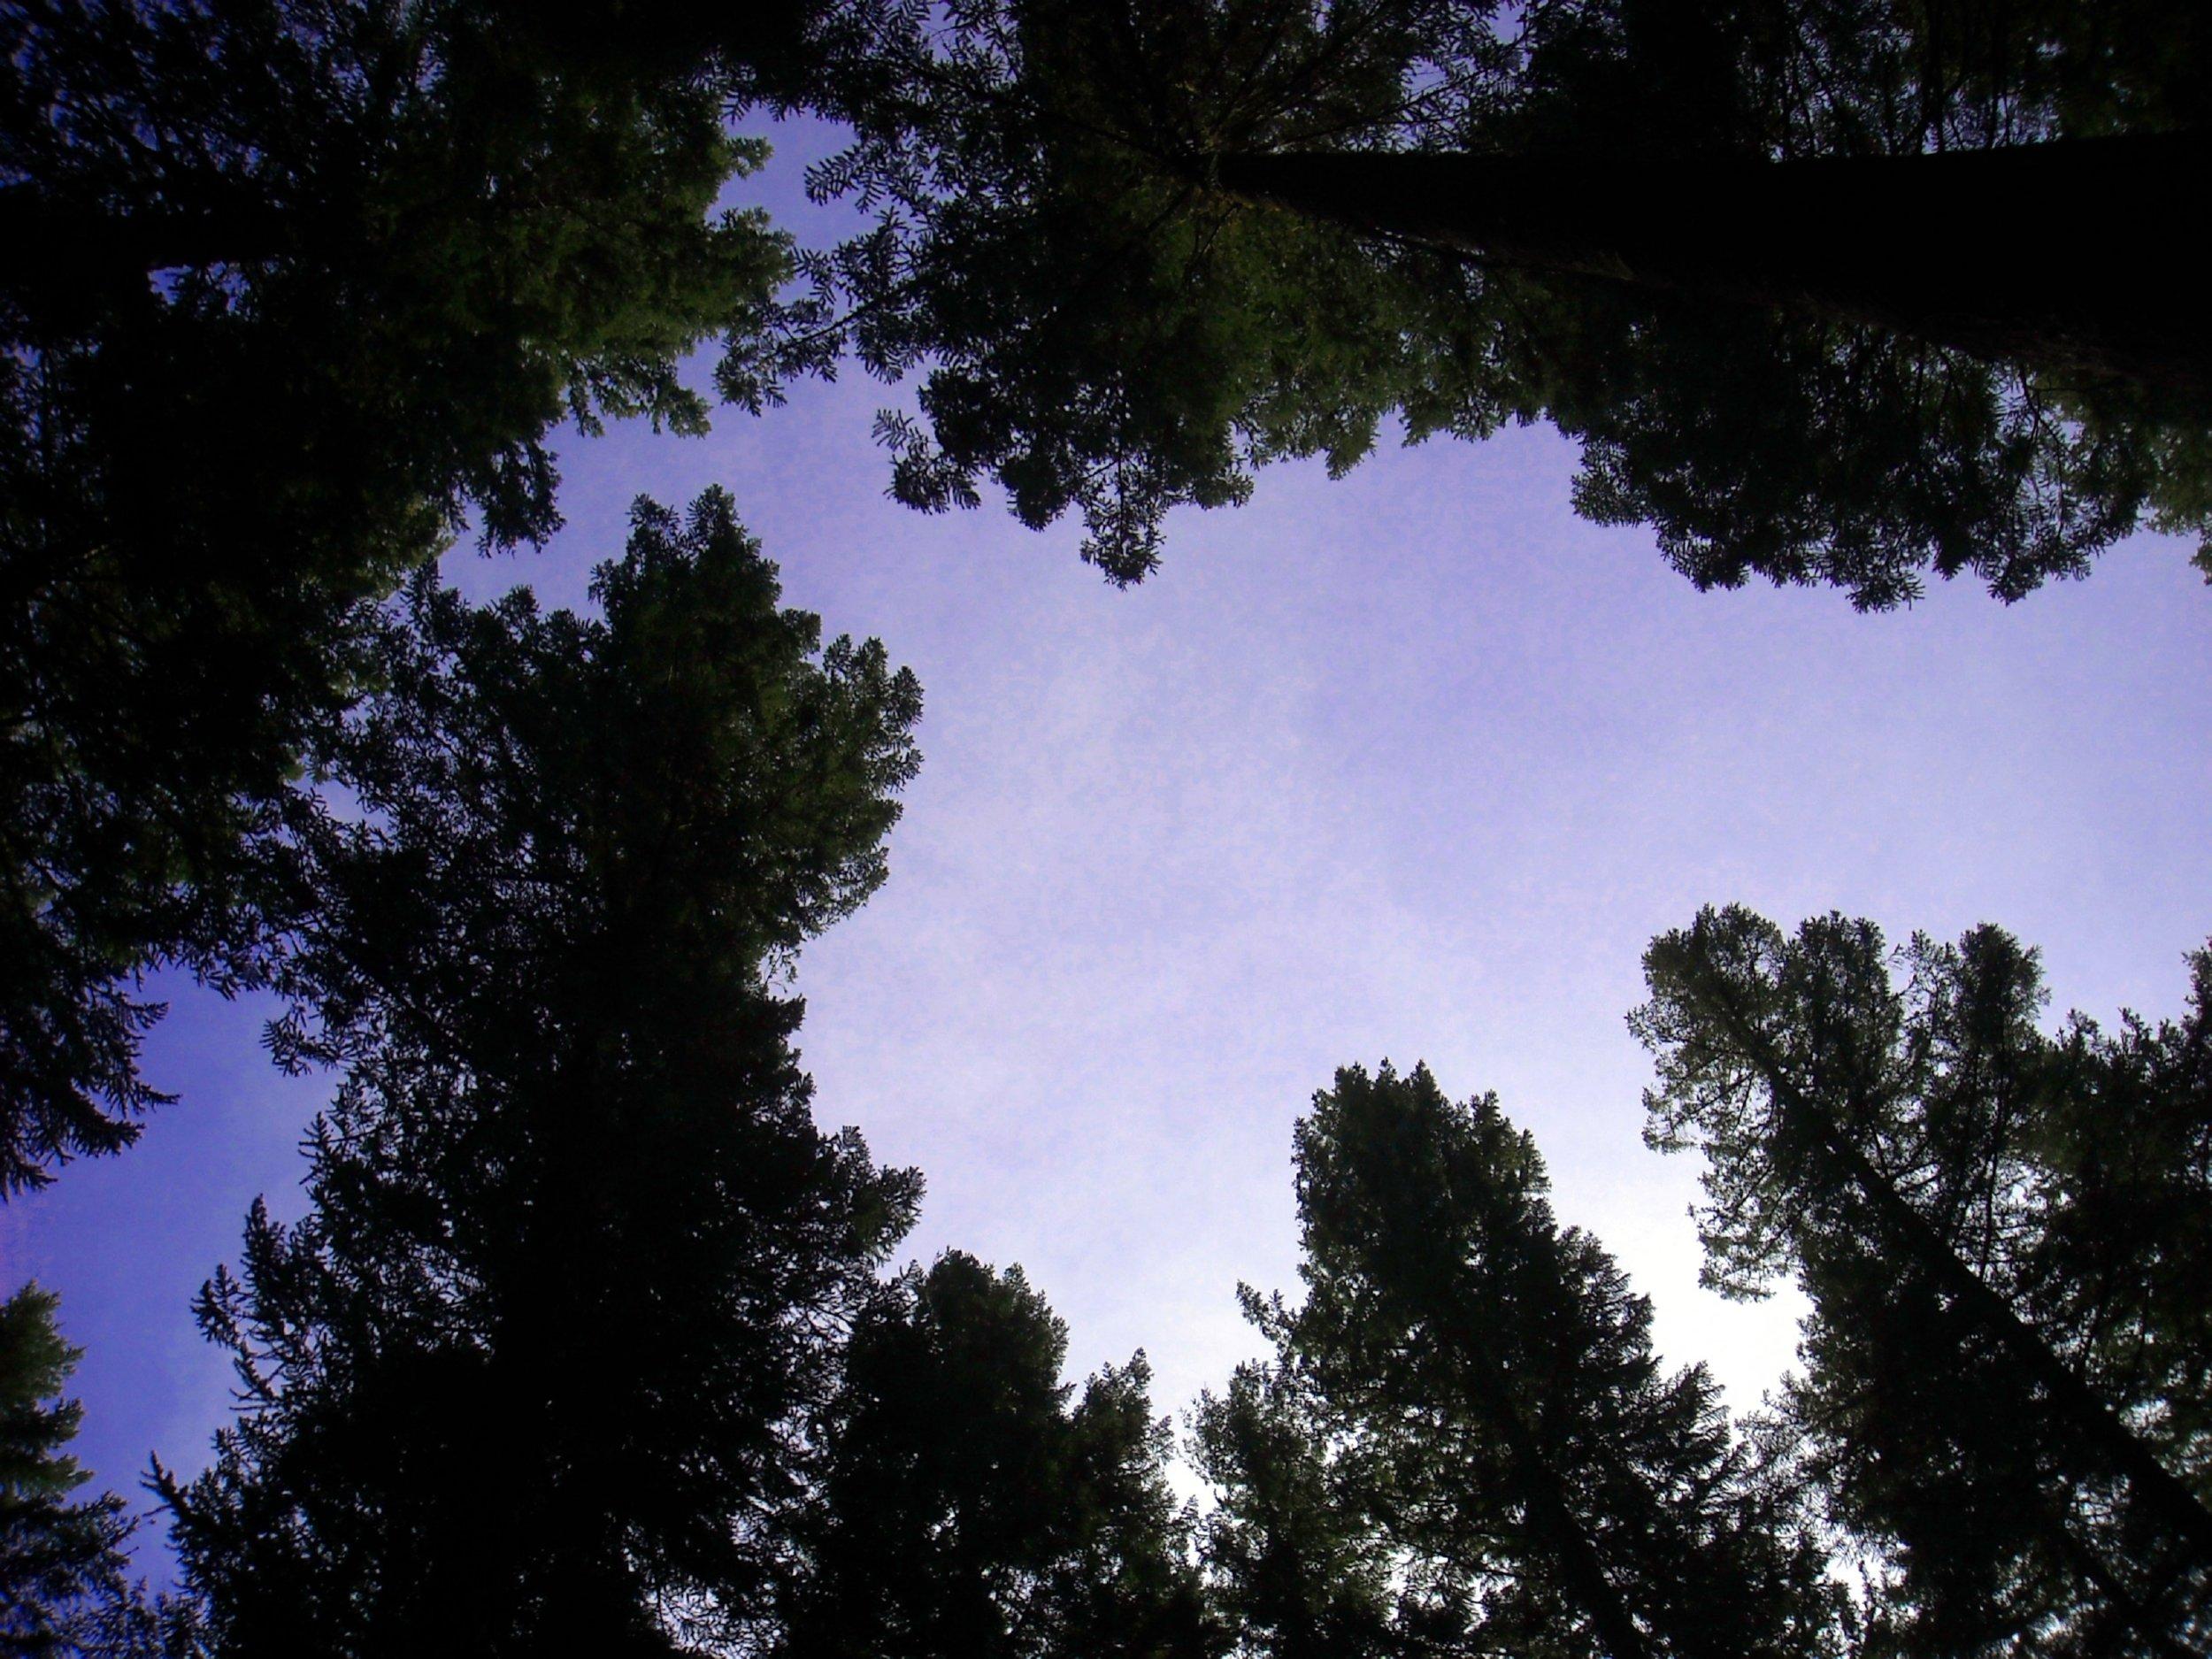 Looking up Washington State